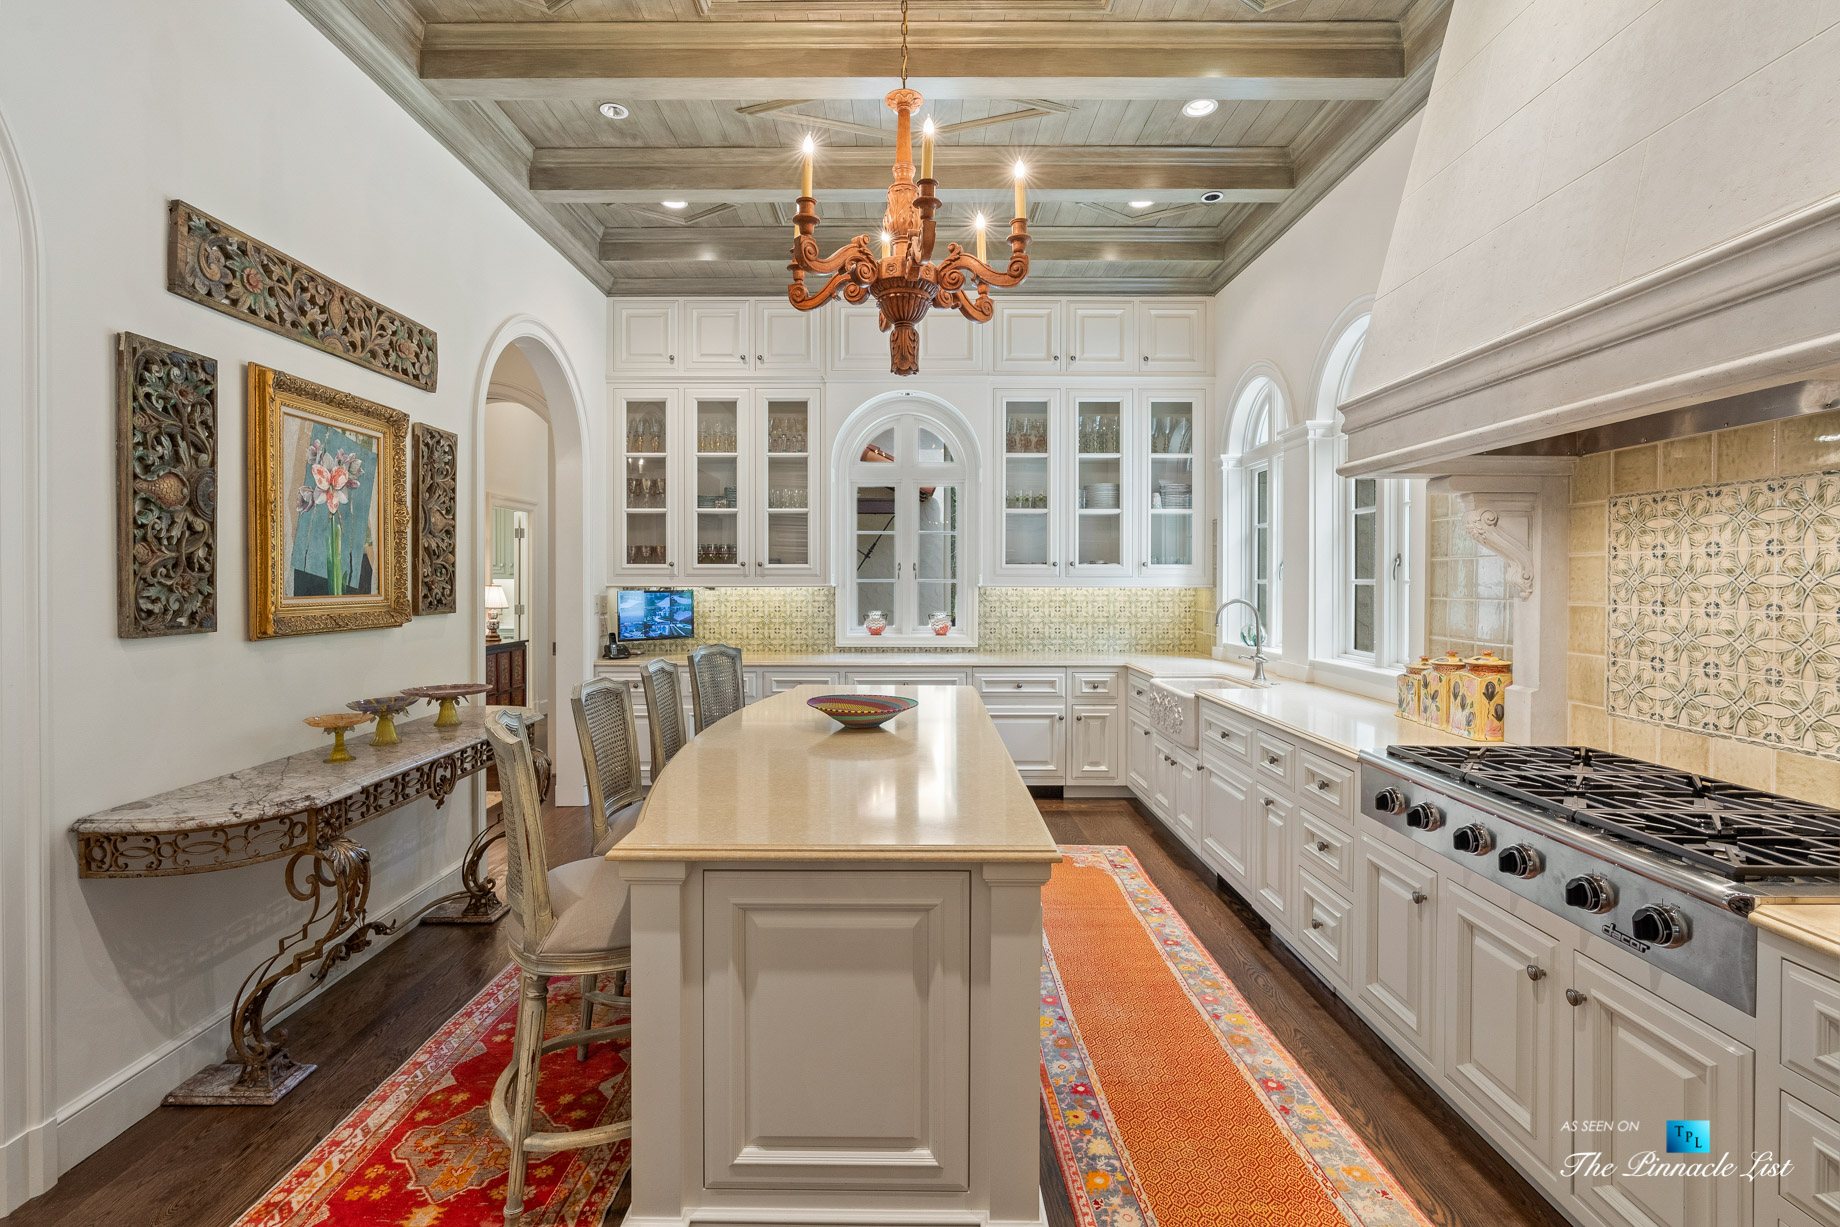 Tuxedo Park Mediterranean Estate - 439 Blackland Rd NW, Atlanta, GA, USA - Kitchen